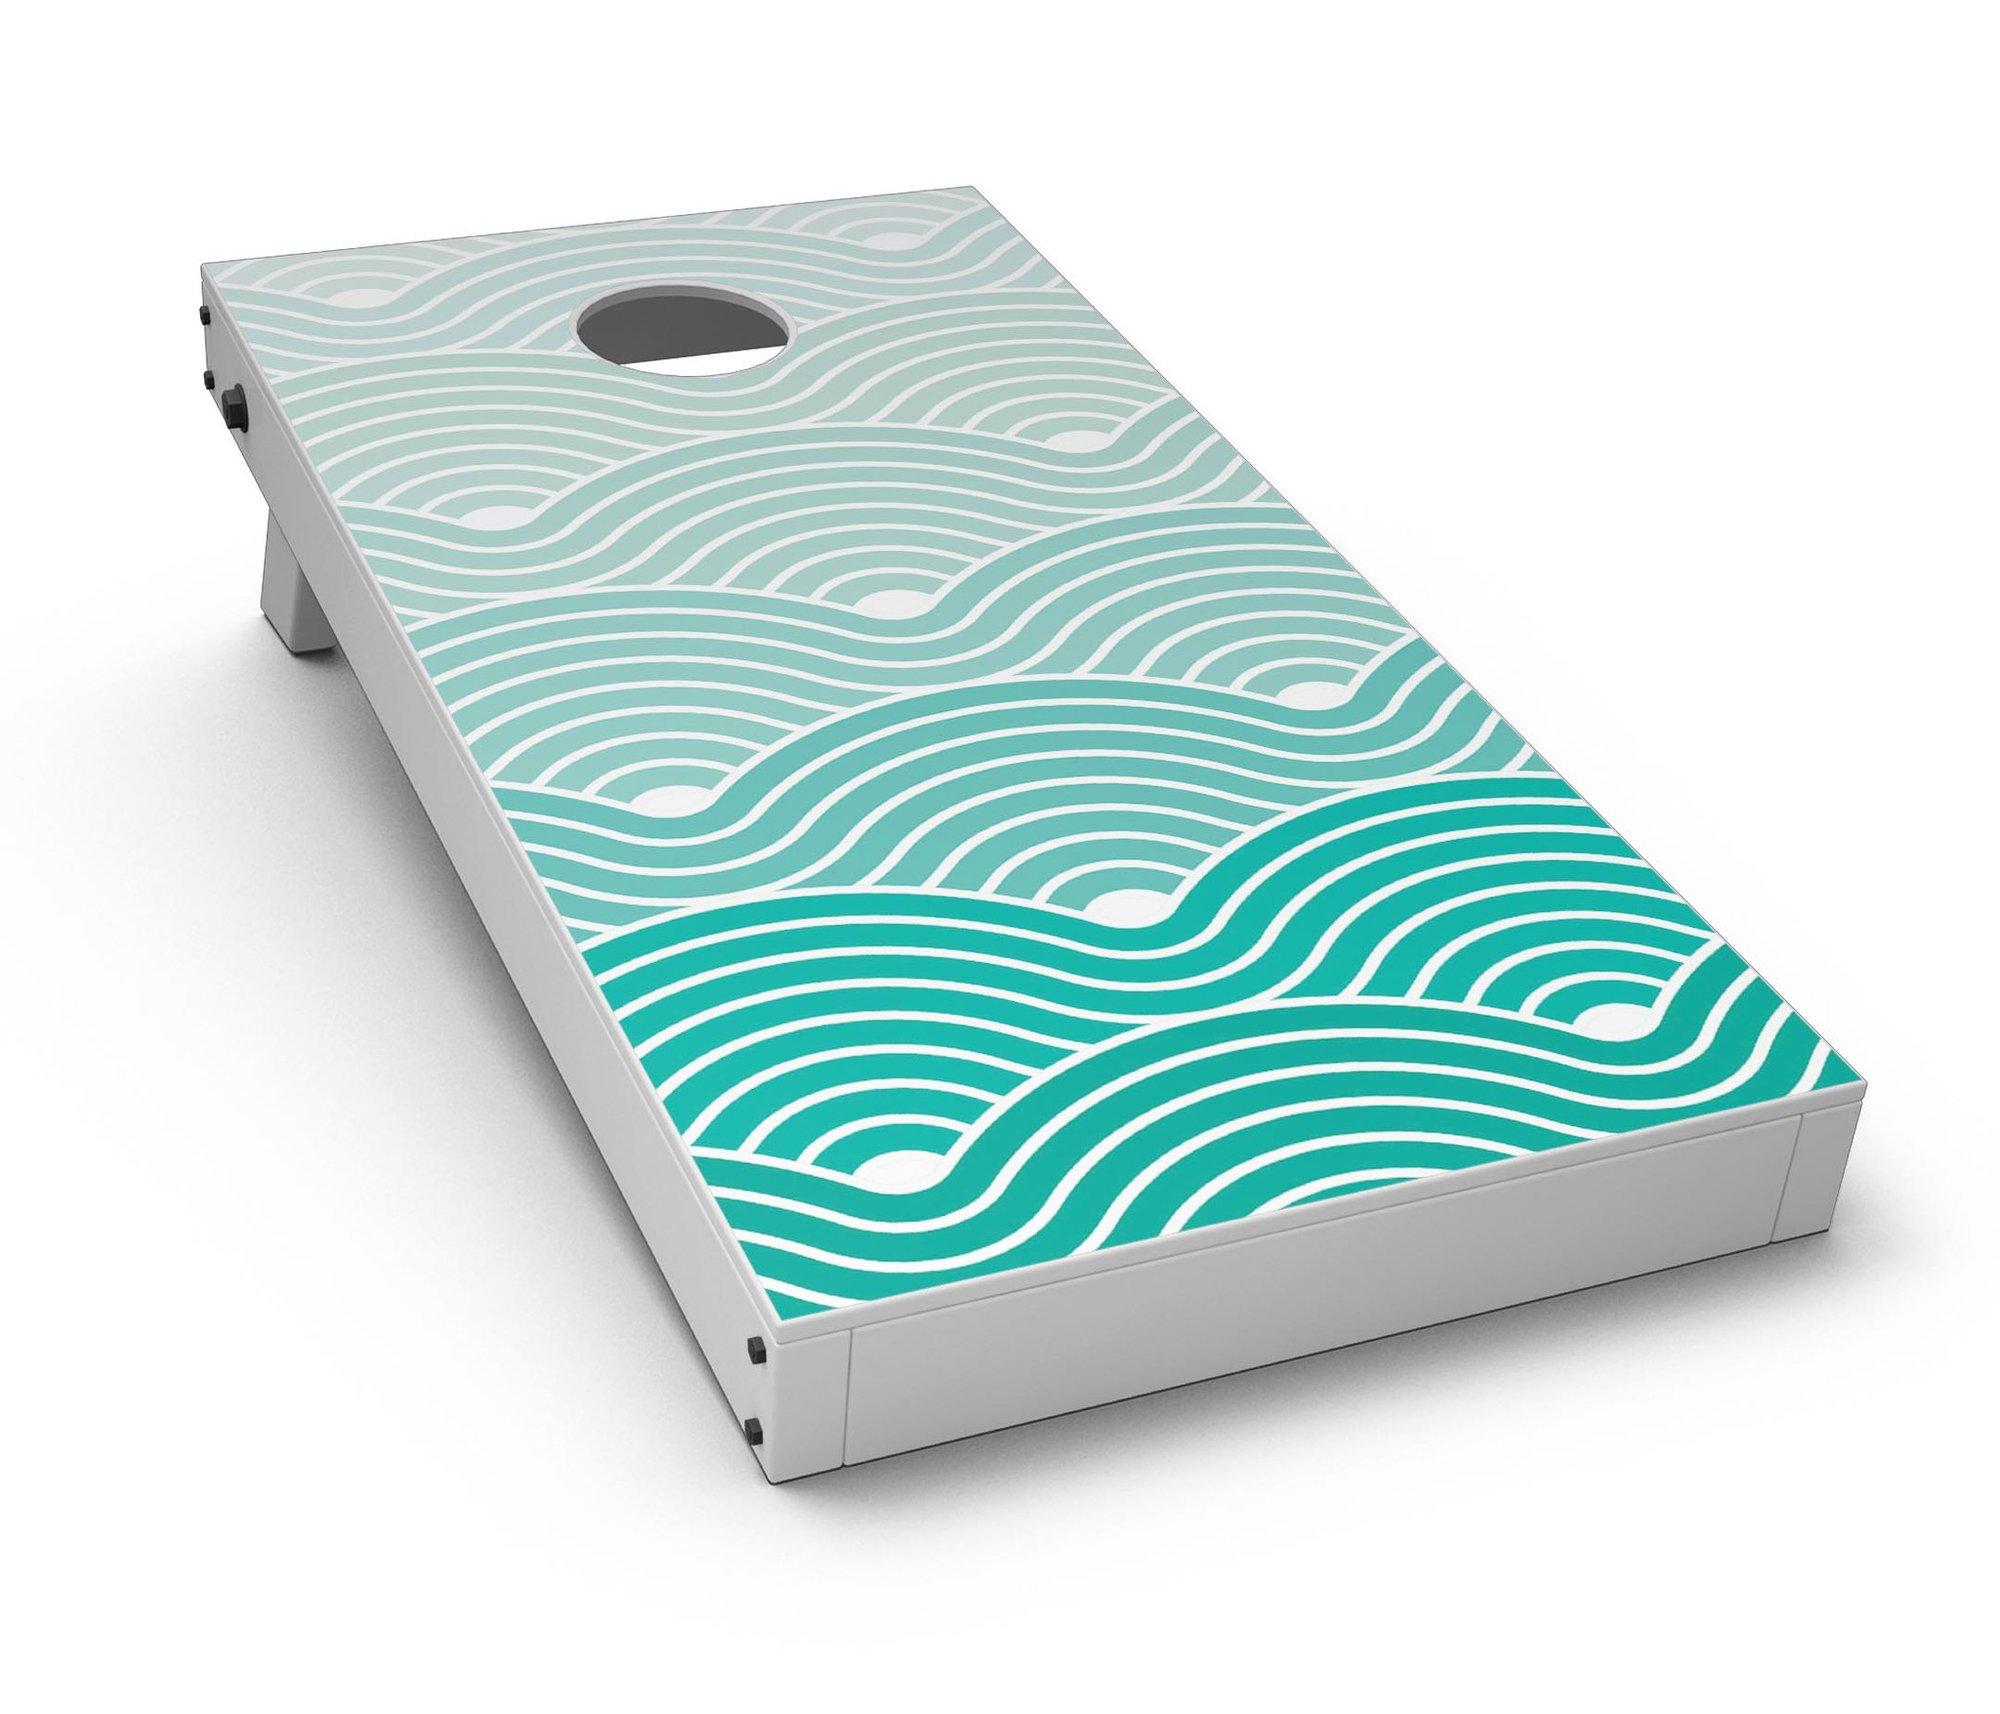 Beach Hotel Wallpaper Waves CornHole Board Skin Decal Kit 2000x1714